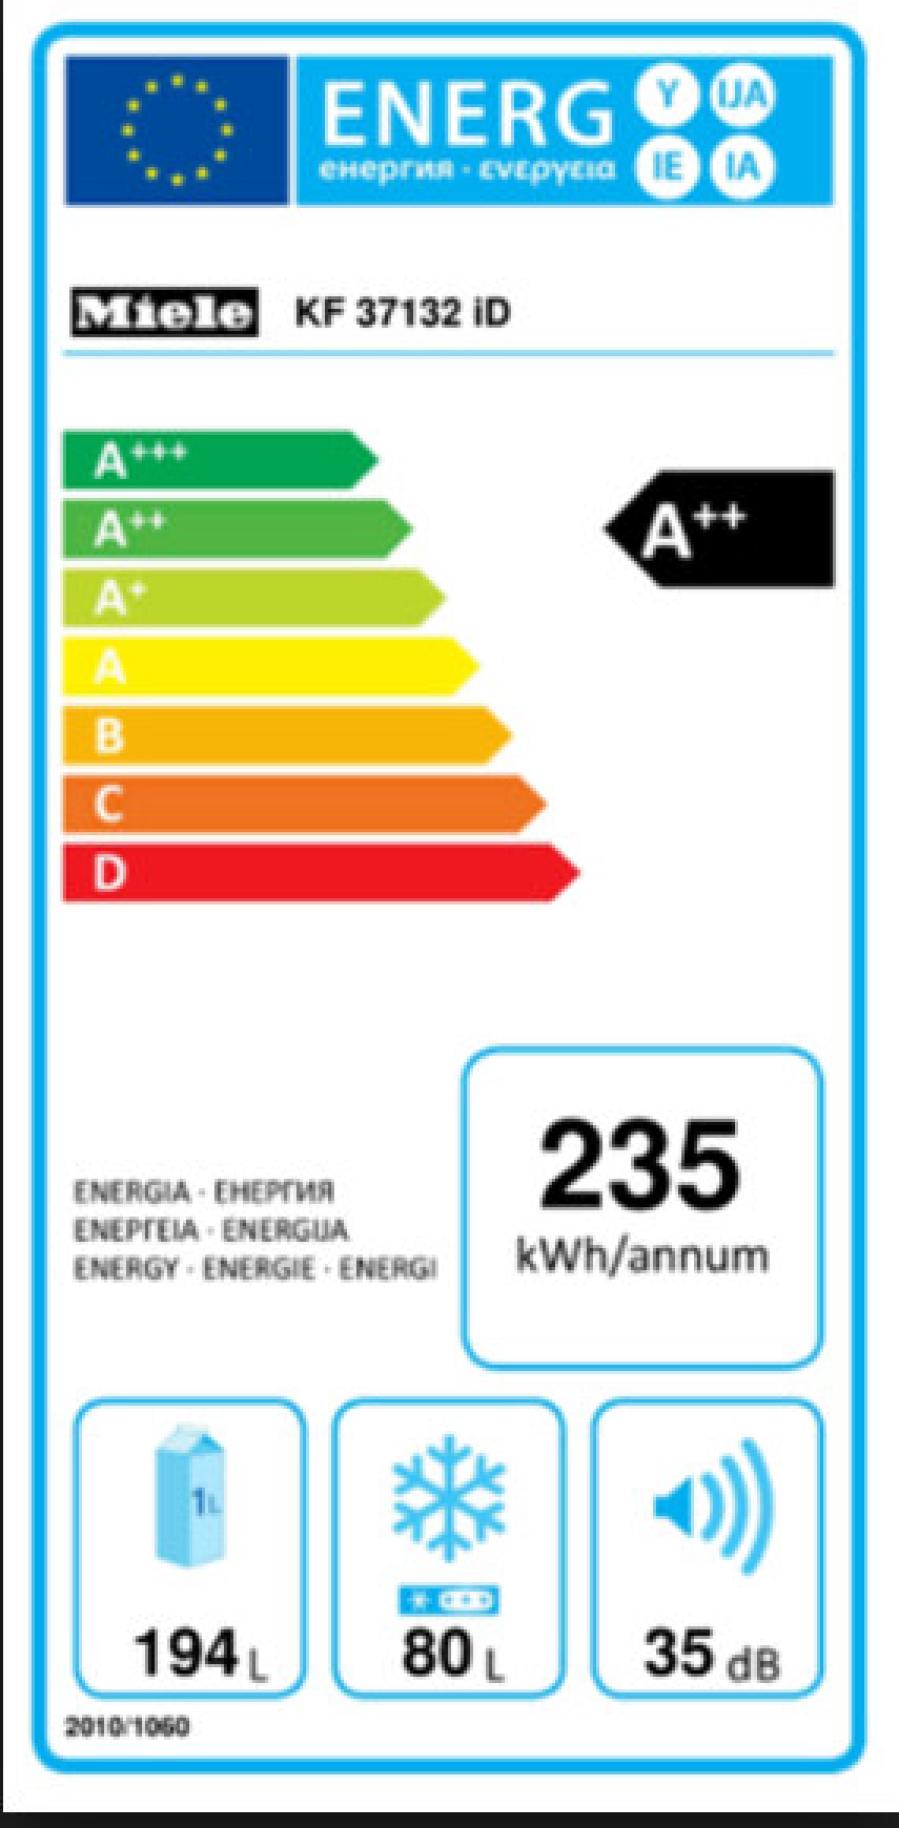 Miele Energielabel kf37132